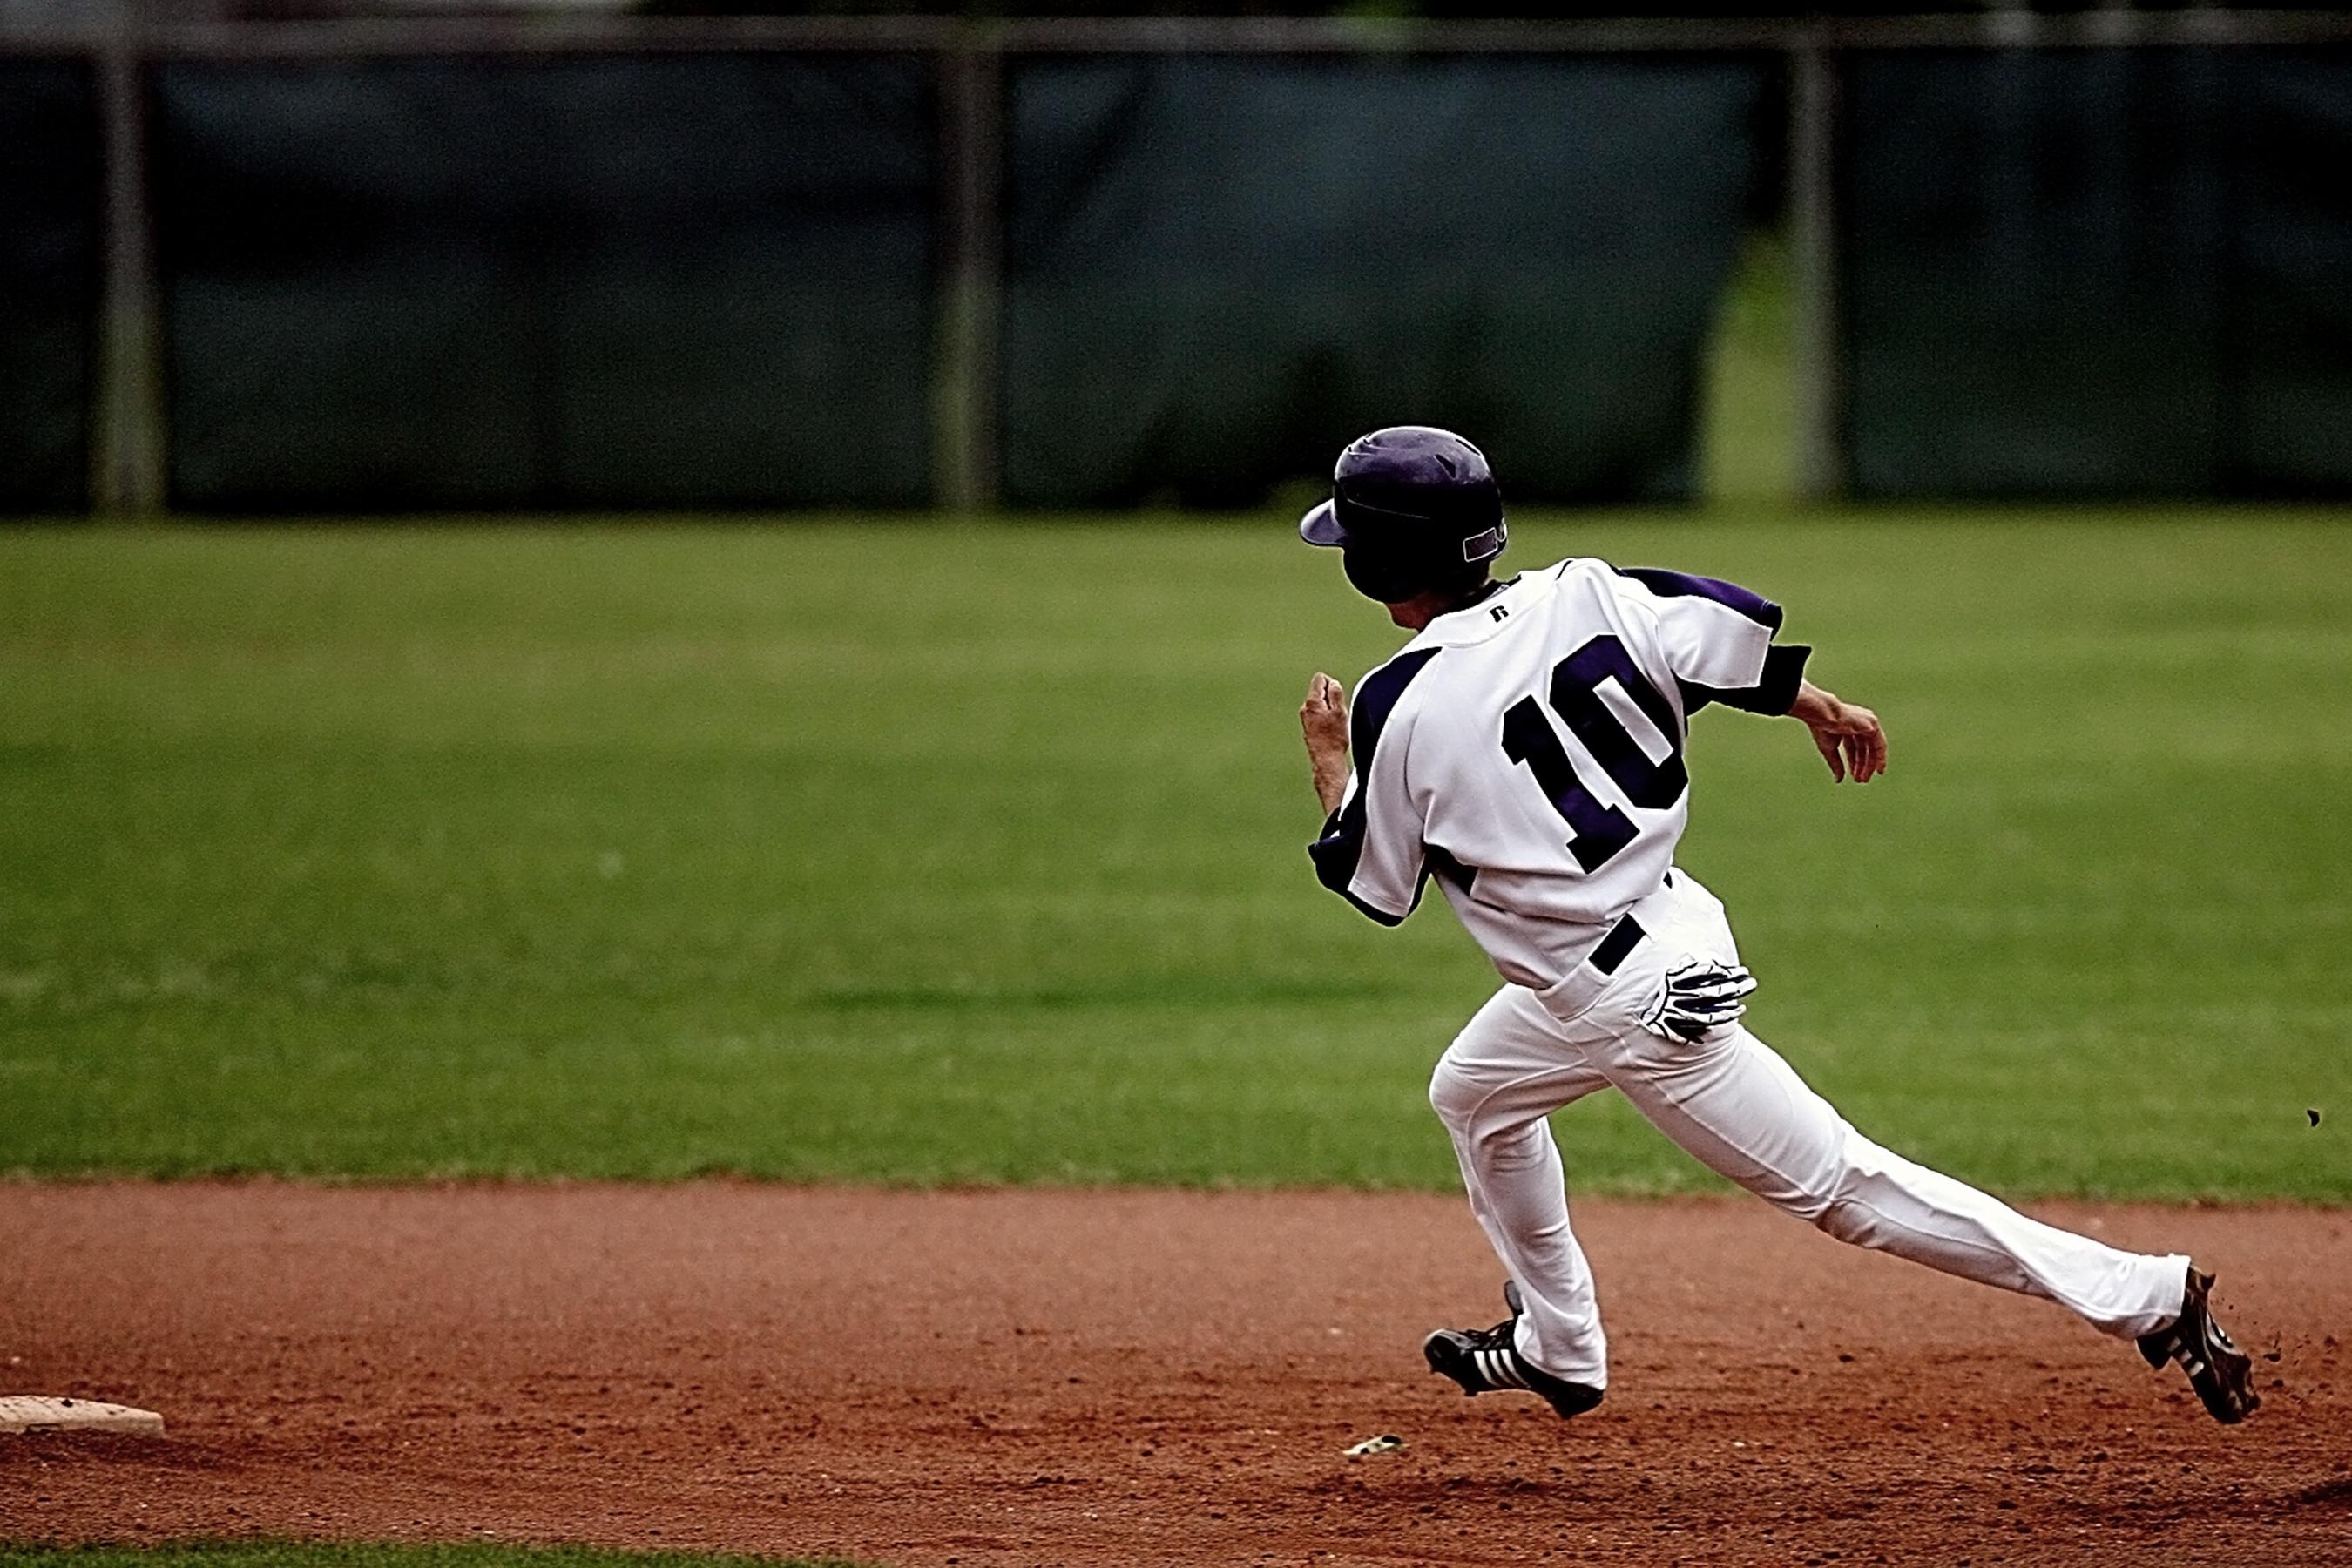 Flywheel training for Baseball players